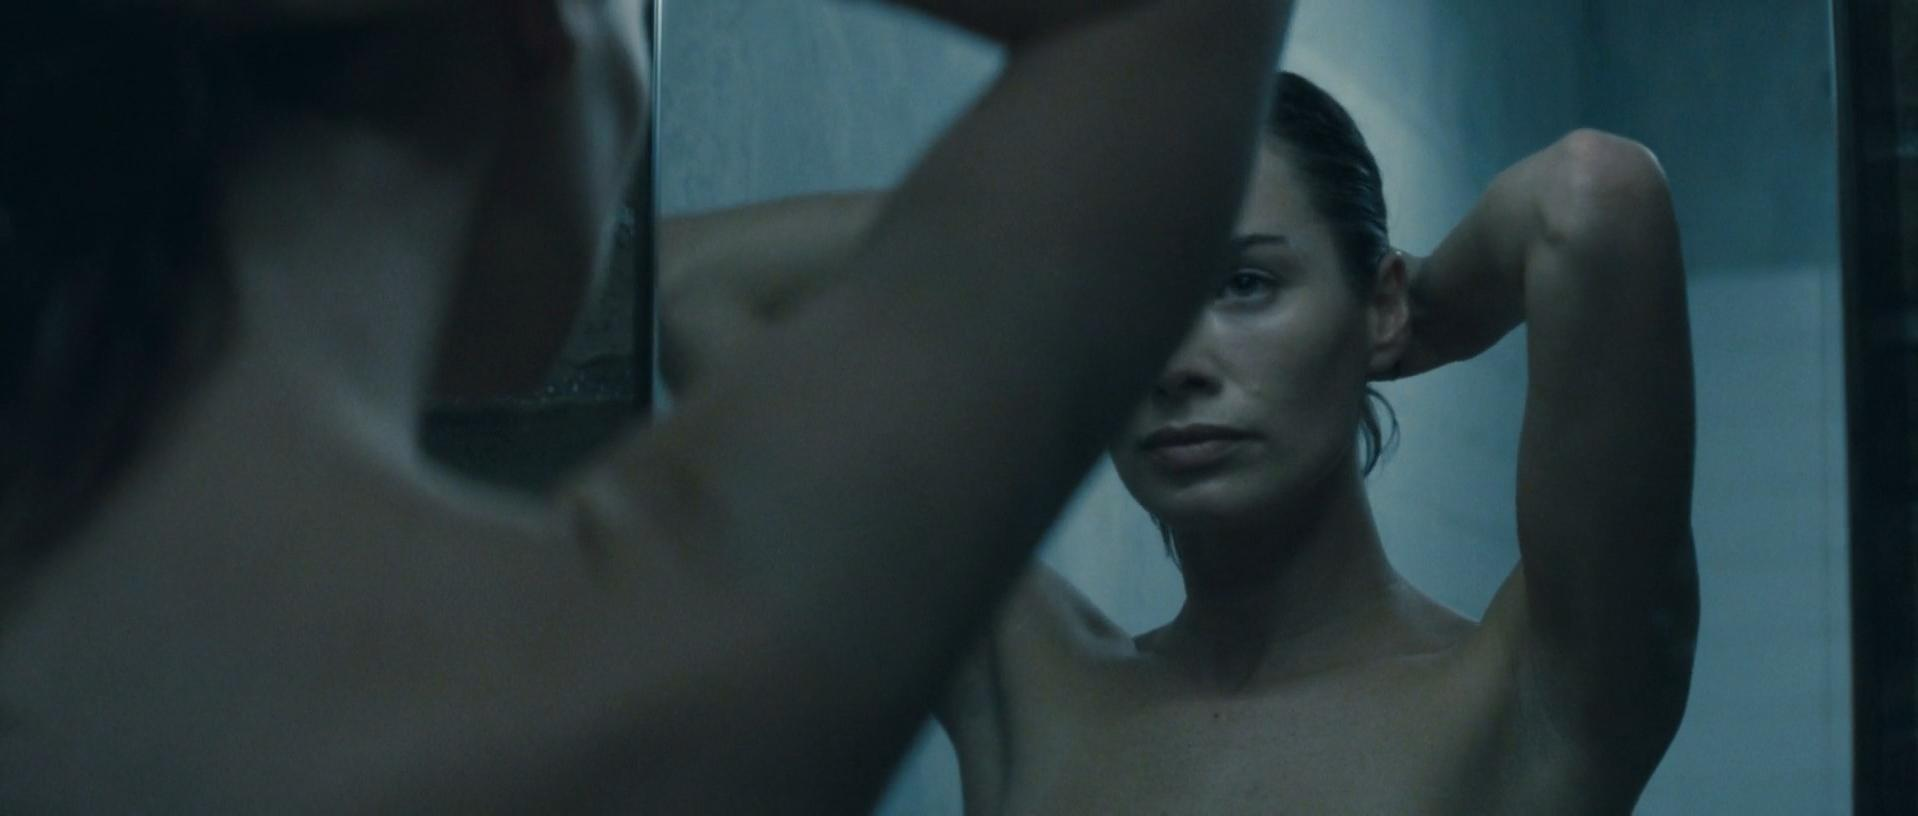 Lena headey nude boobs in aberdeen movie scandalplanetcom - 3 2